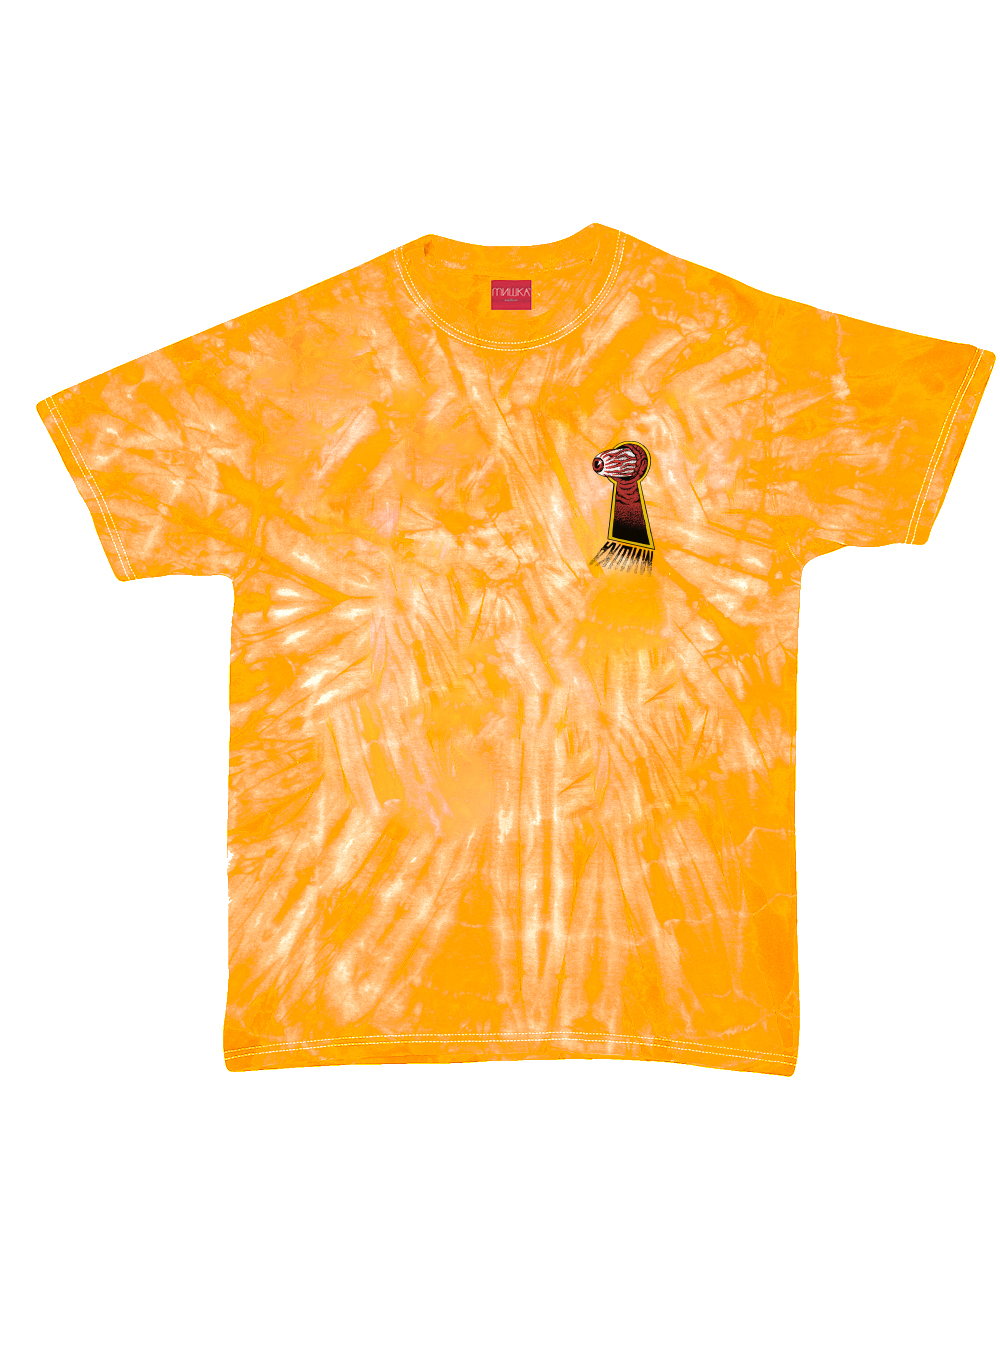 Keyhole Keep Watch Tie-Dye T-Shirt